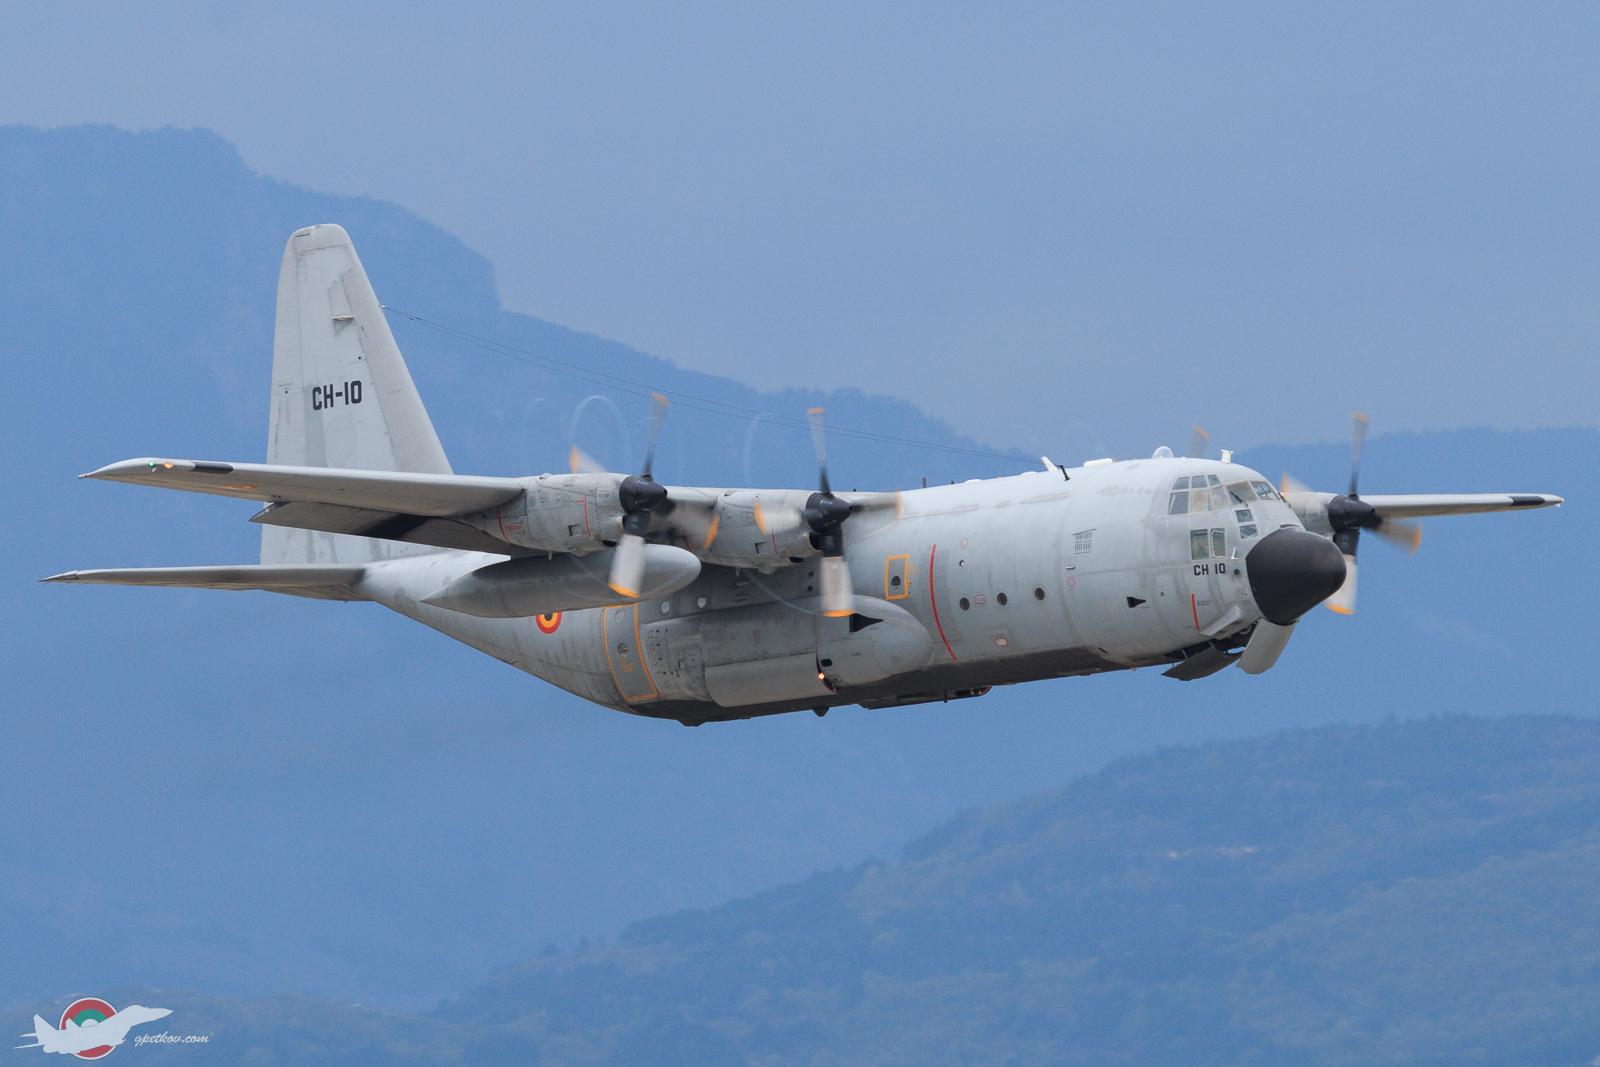 European Advanced Airlift Tactics Training Course EAATTC 17-1